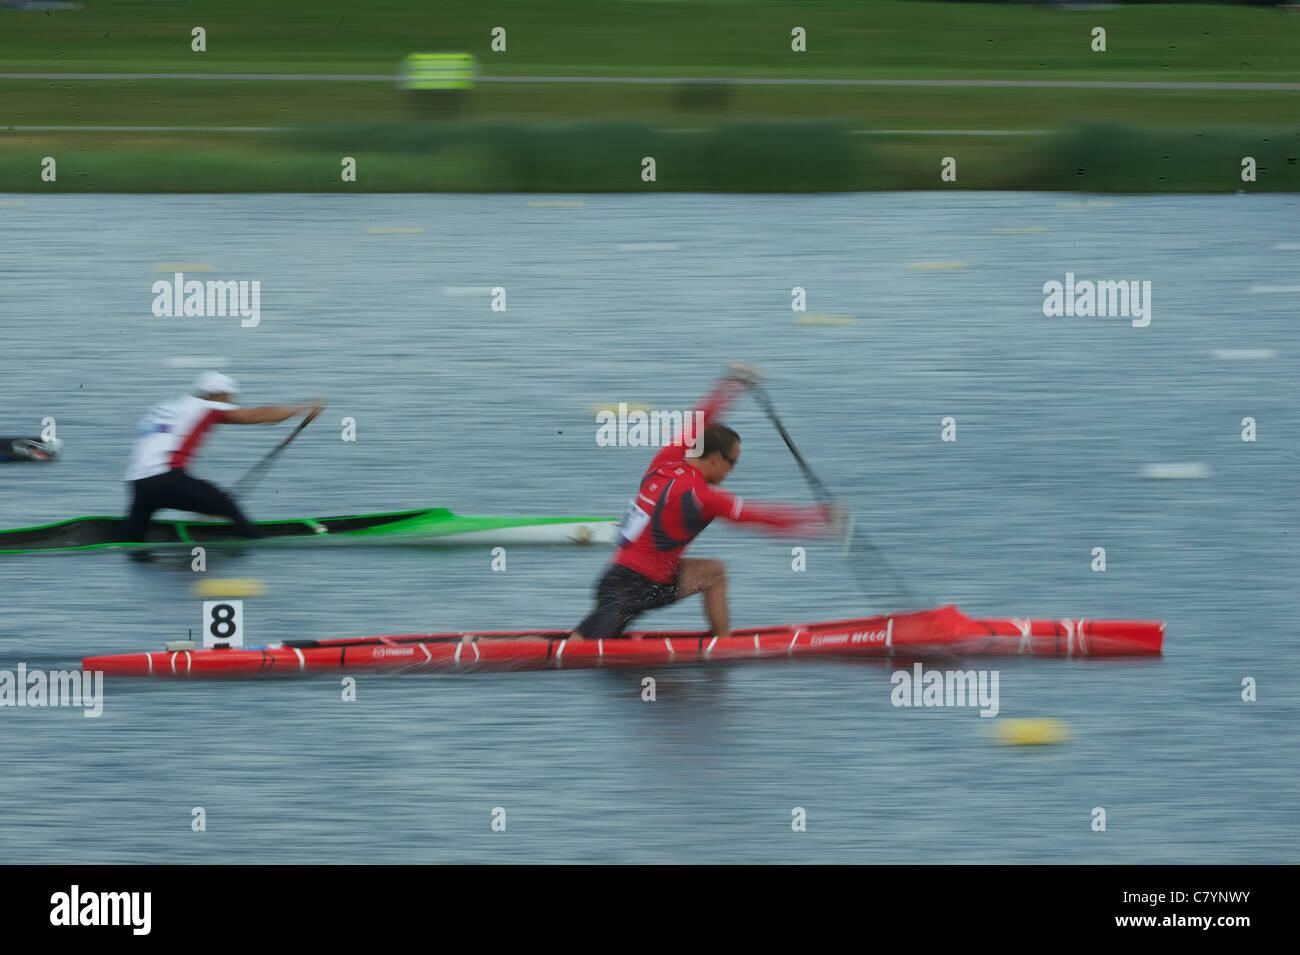 Competitors at start, Canoe Sprint Olympic Test Event, men's 200m C1, Eton Dorney Lake Eton Dorney, England - Stock Image